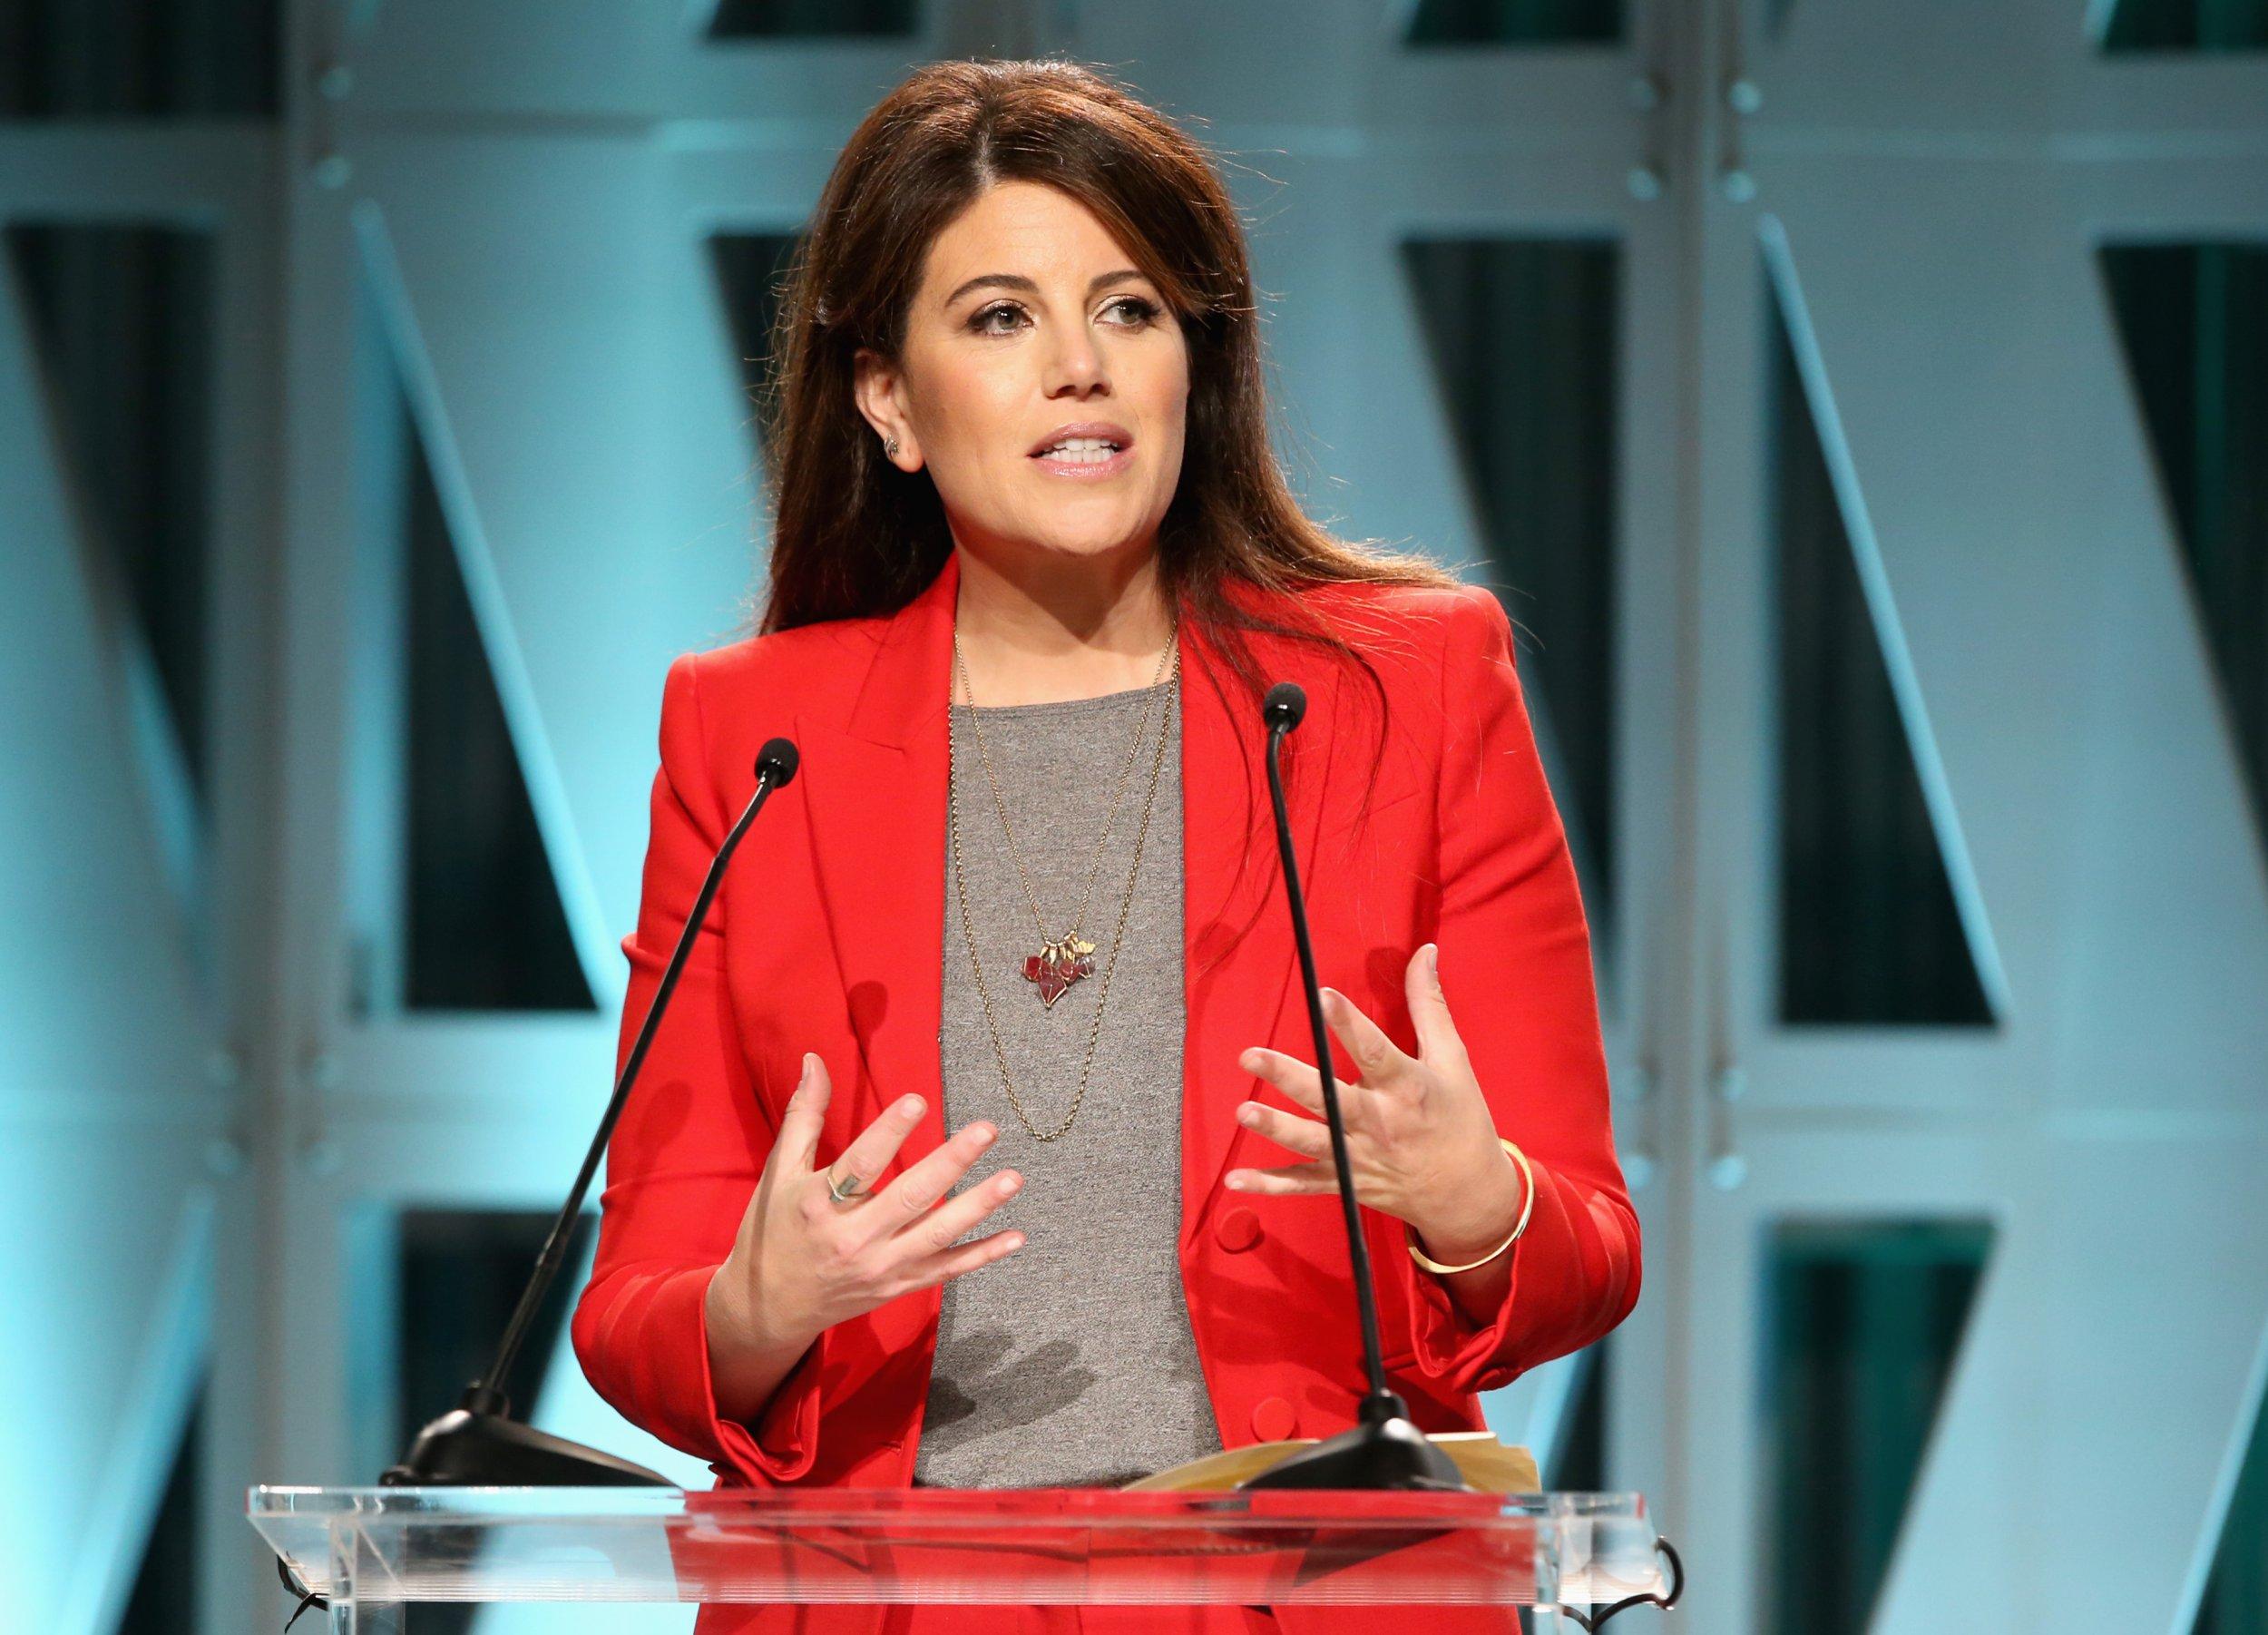 Monica Lewinsky, Starr Report